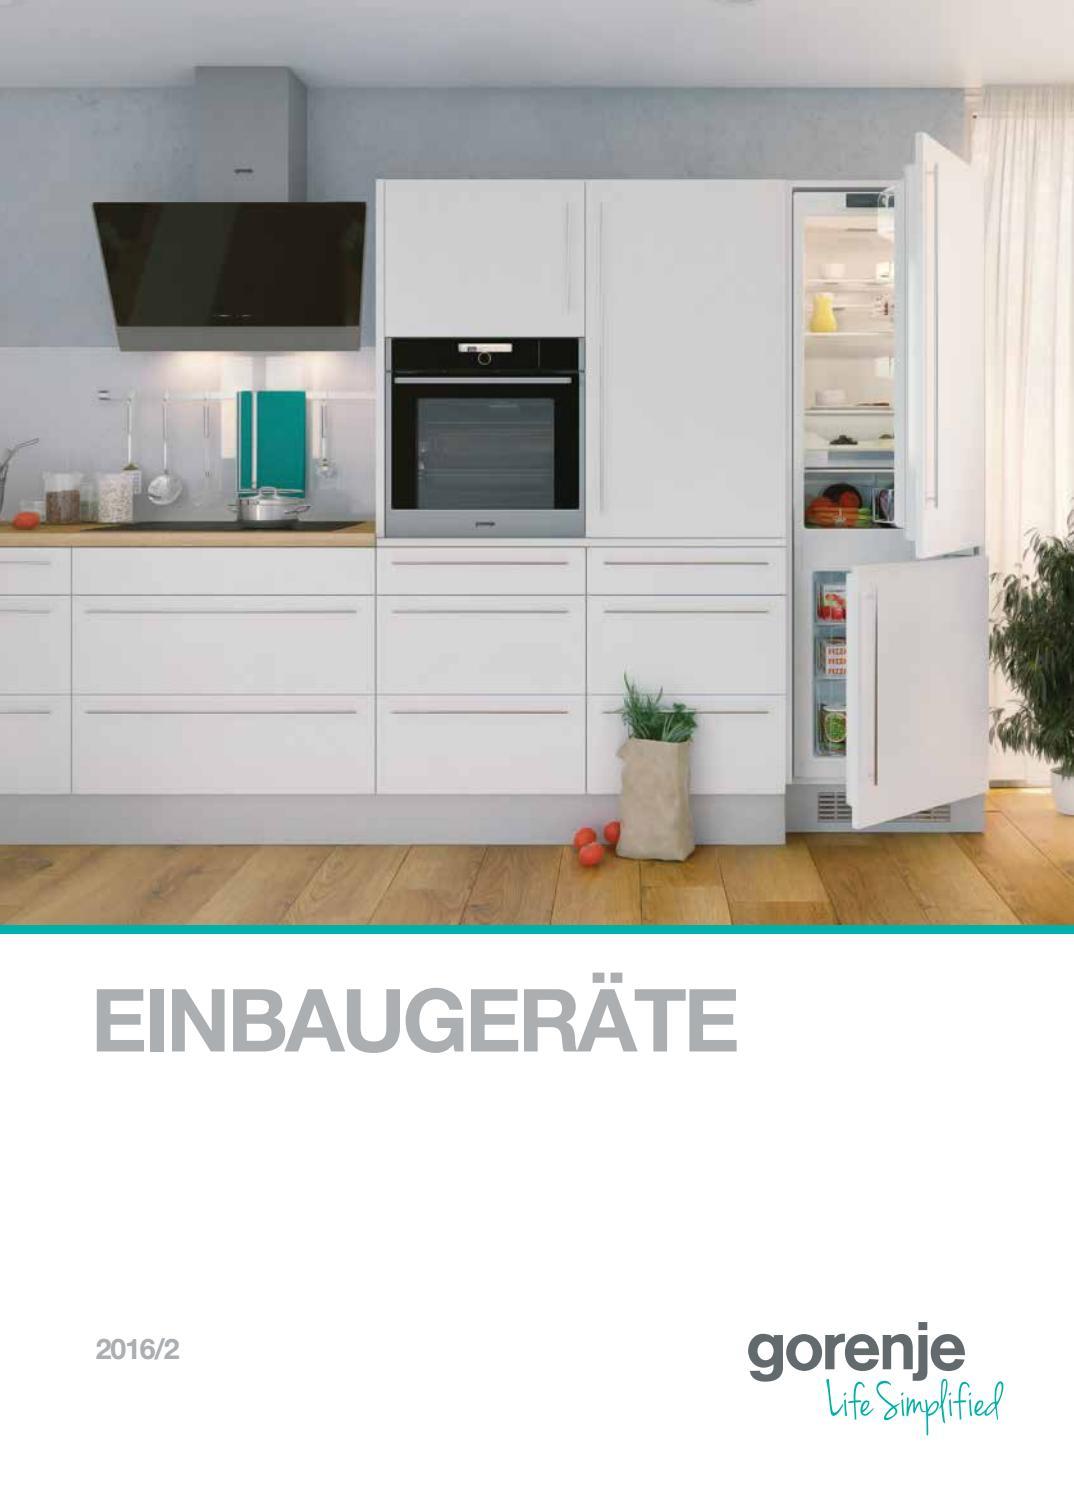 Katalog einbaugeräte Gorenje 2016 by Gorenje d.d. - issuu